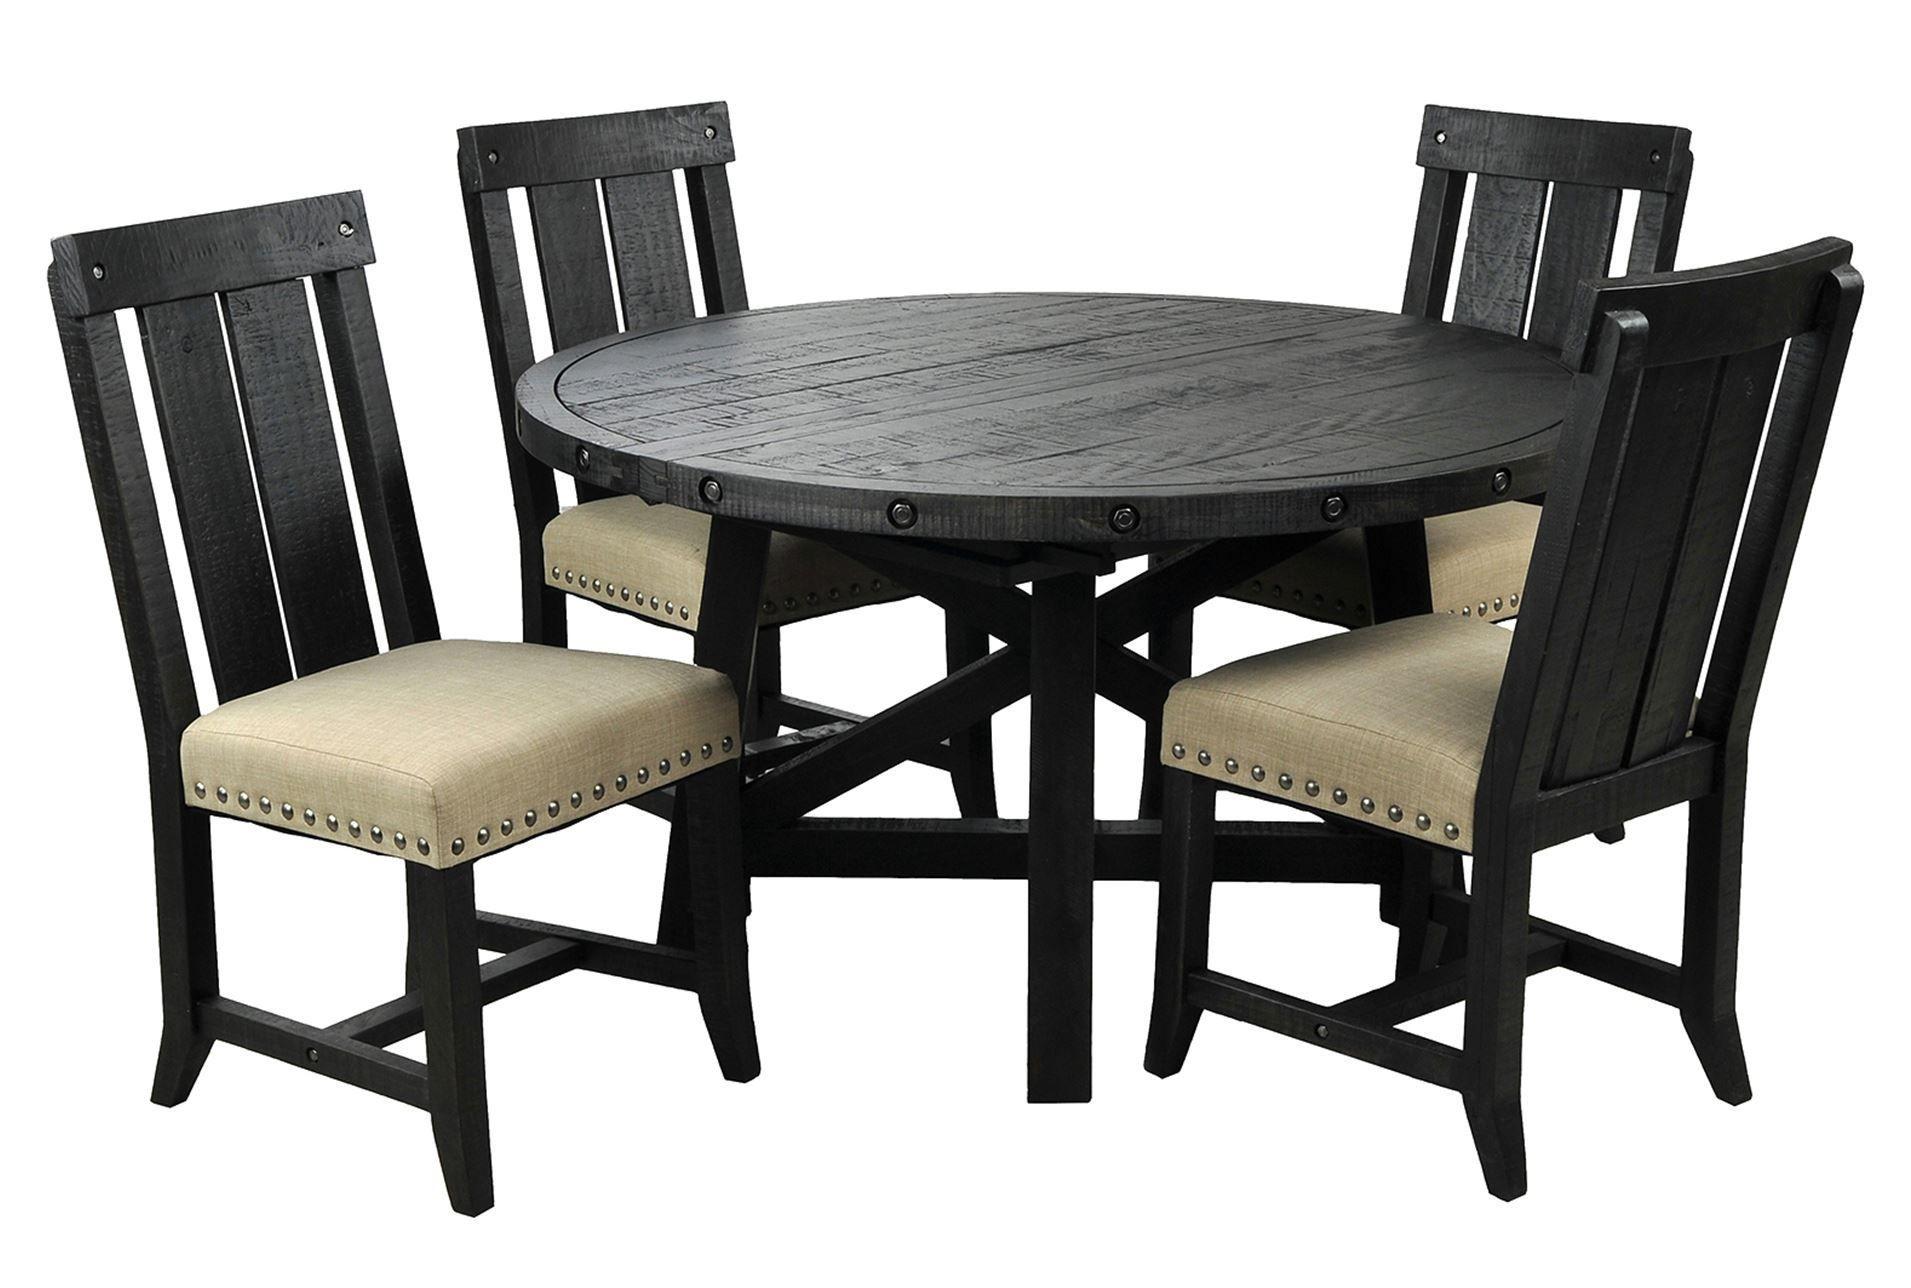 Jaxon 5 Piece Round Dining Set W Wood Chairs